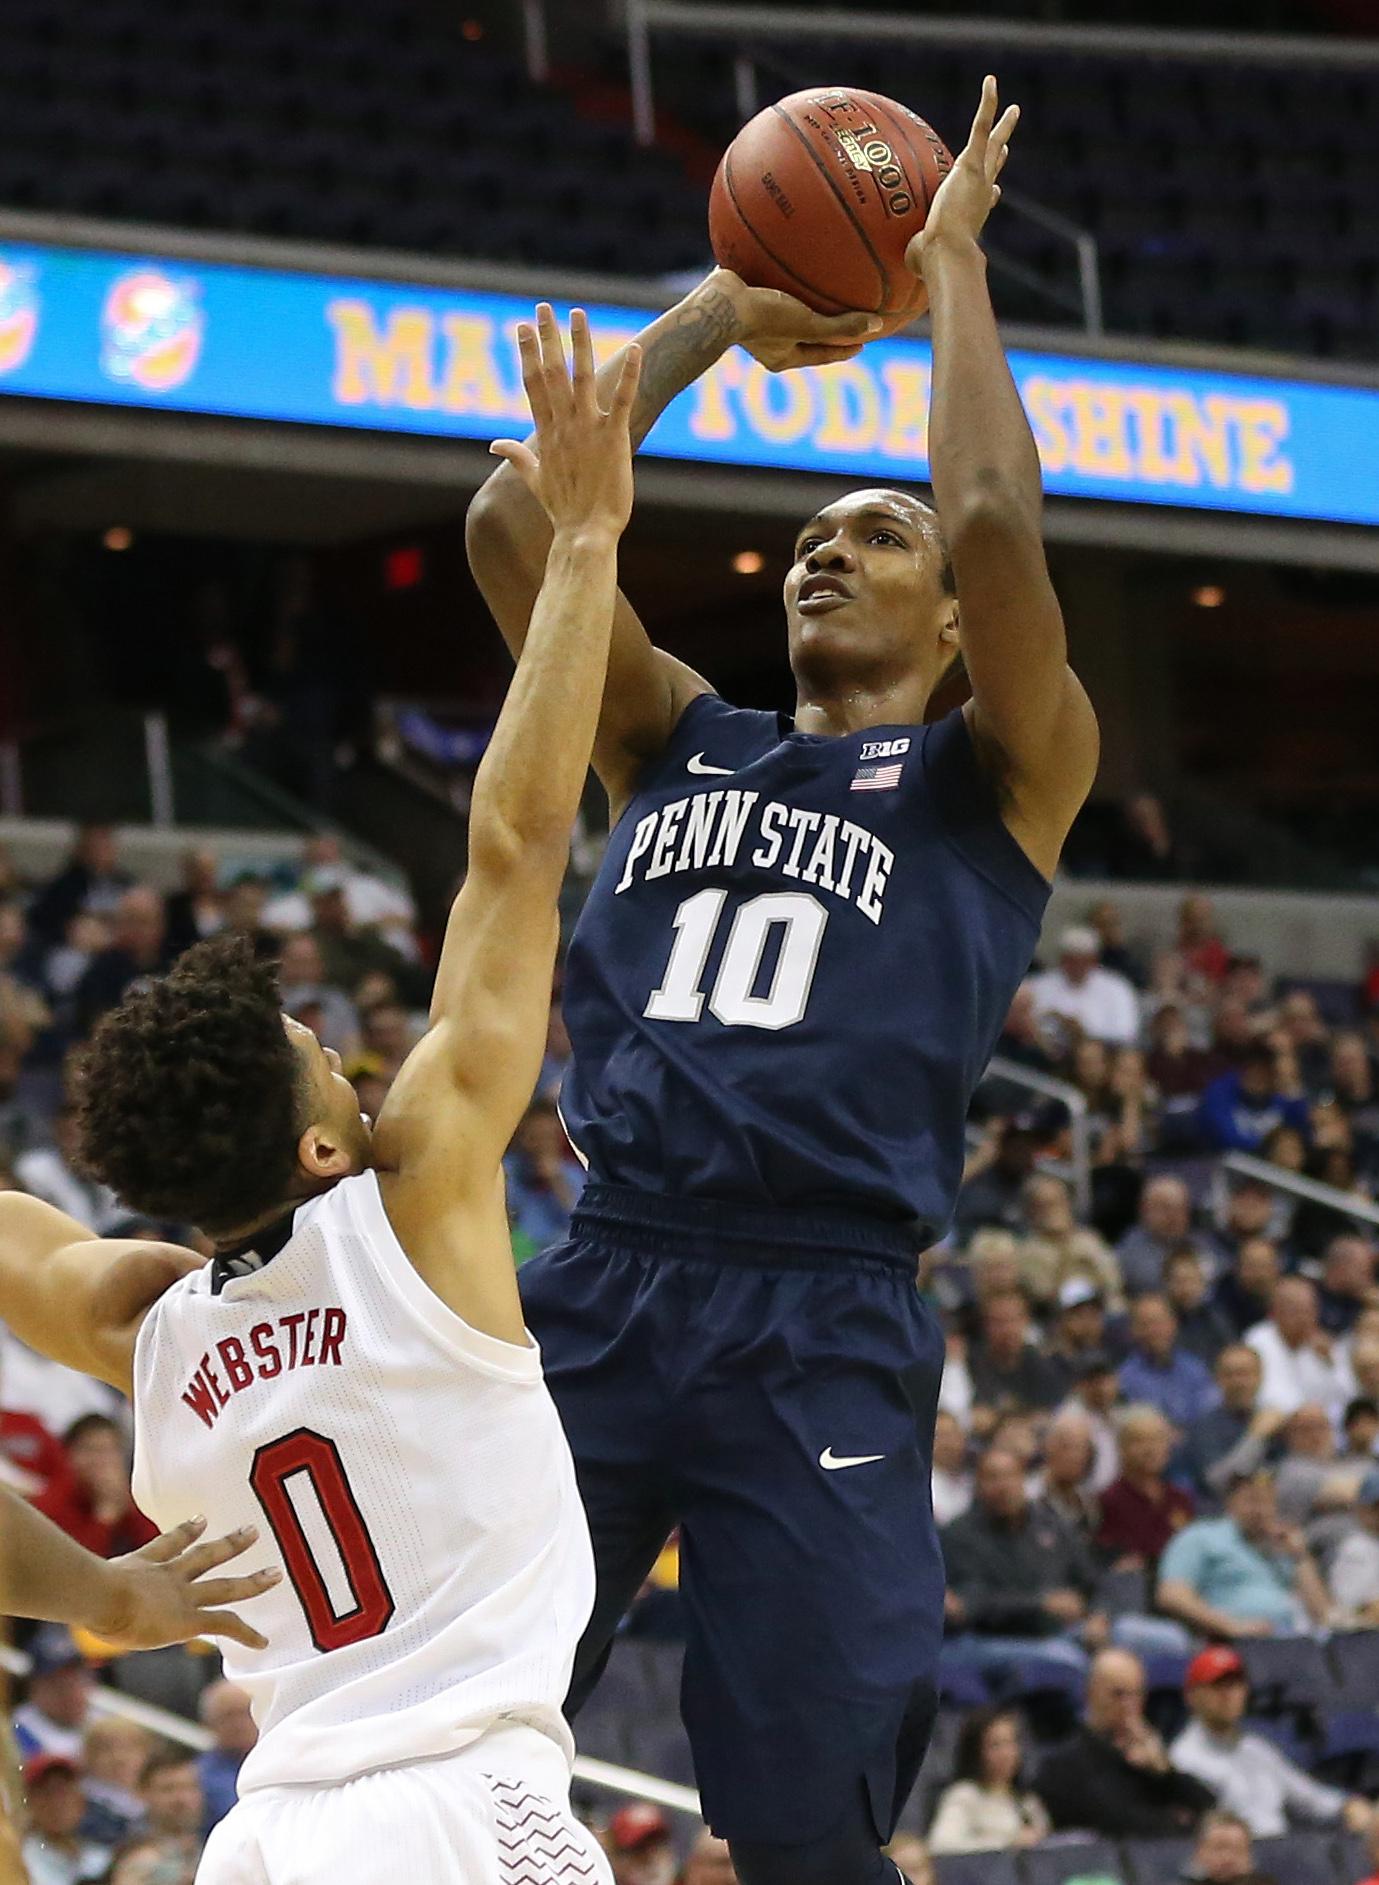 9926168-ncaa-basketball-big-ten-conference-tournament-penn-state-vs-nebraska